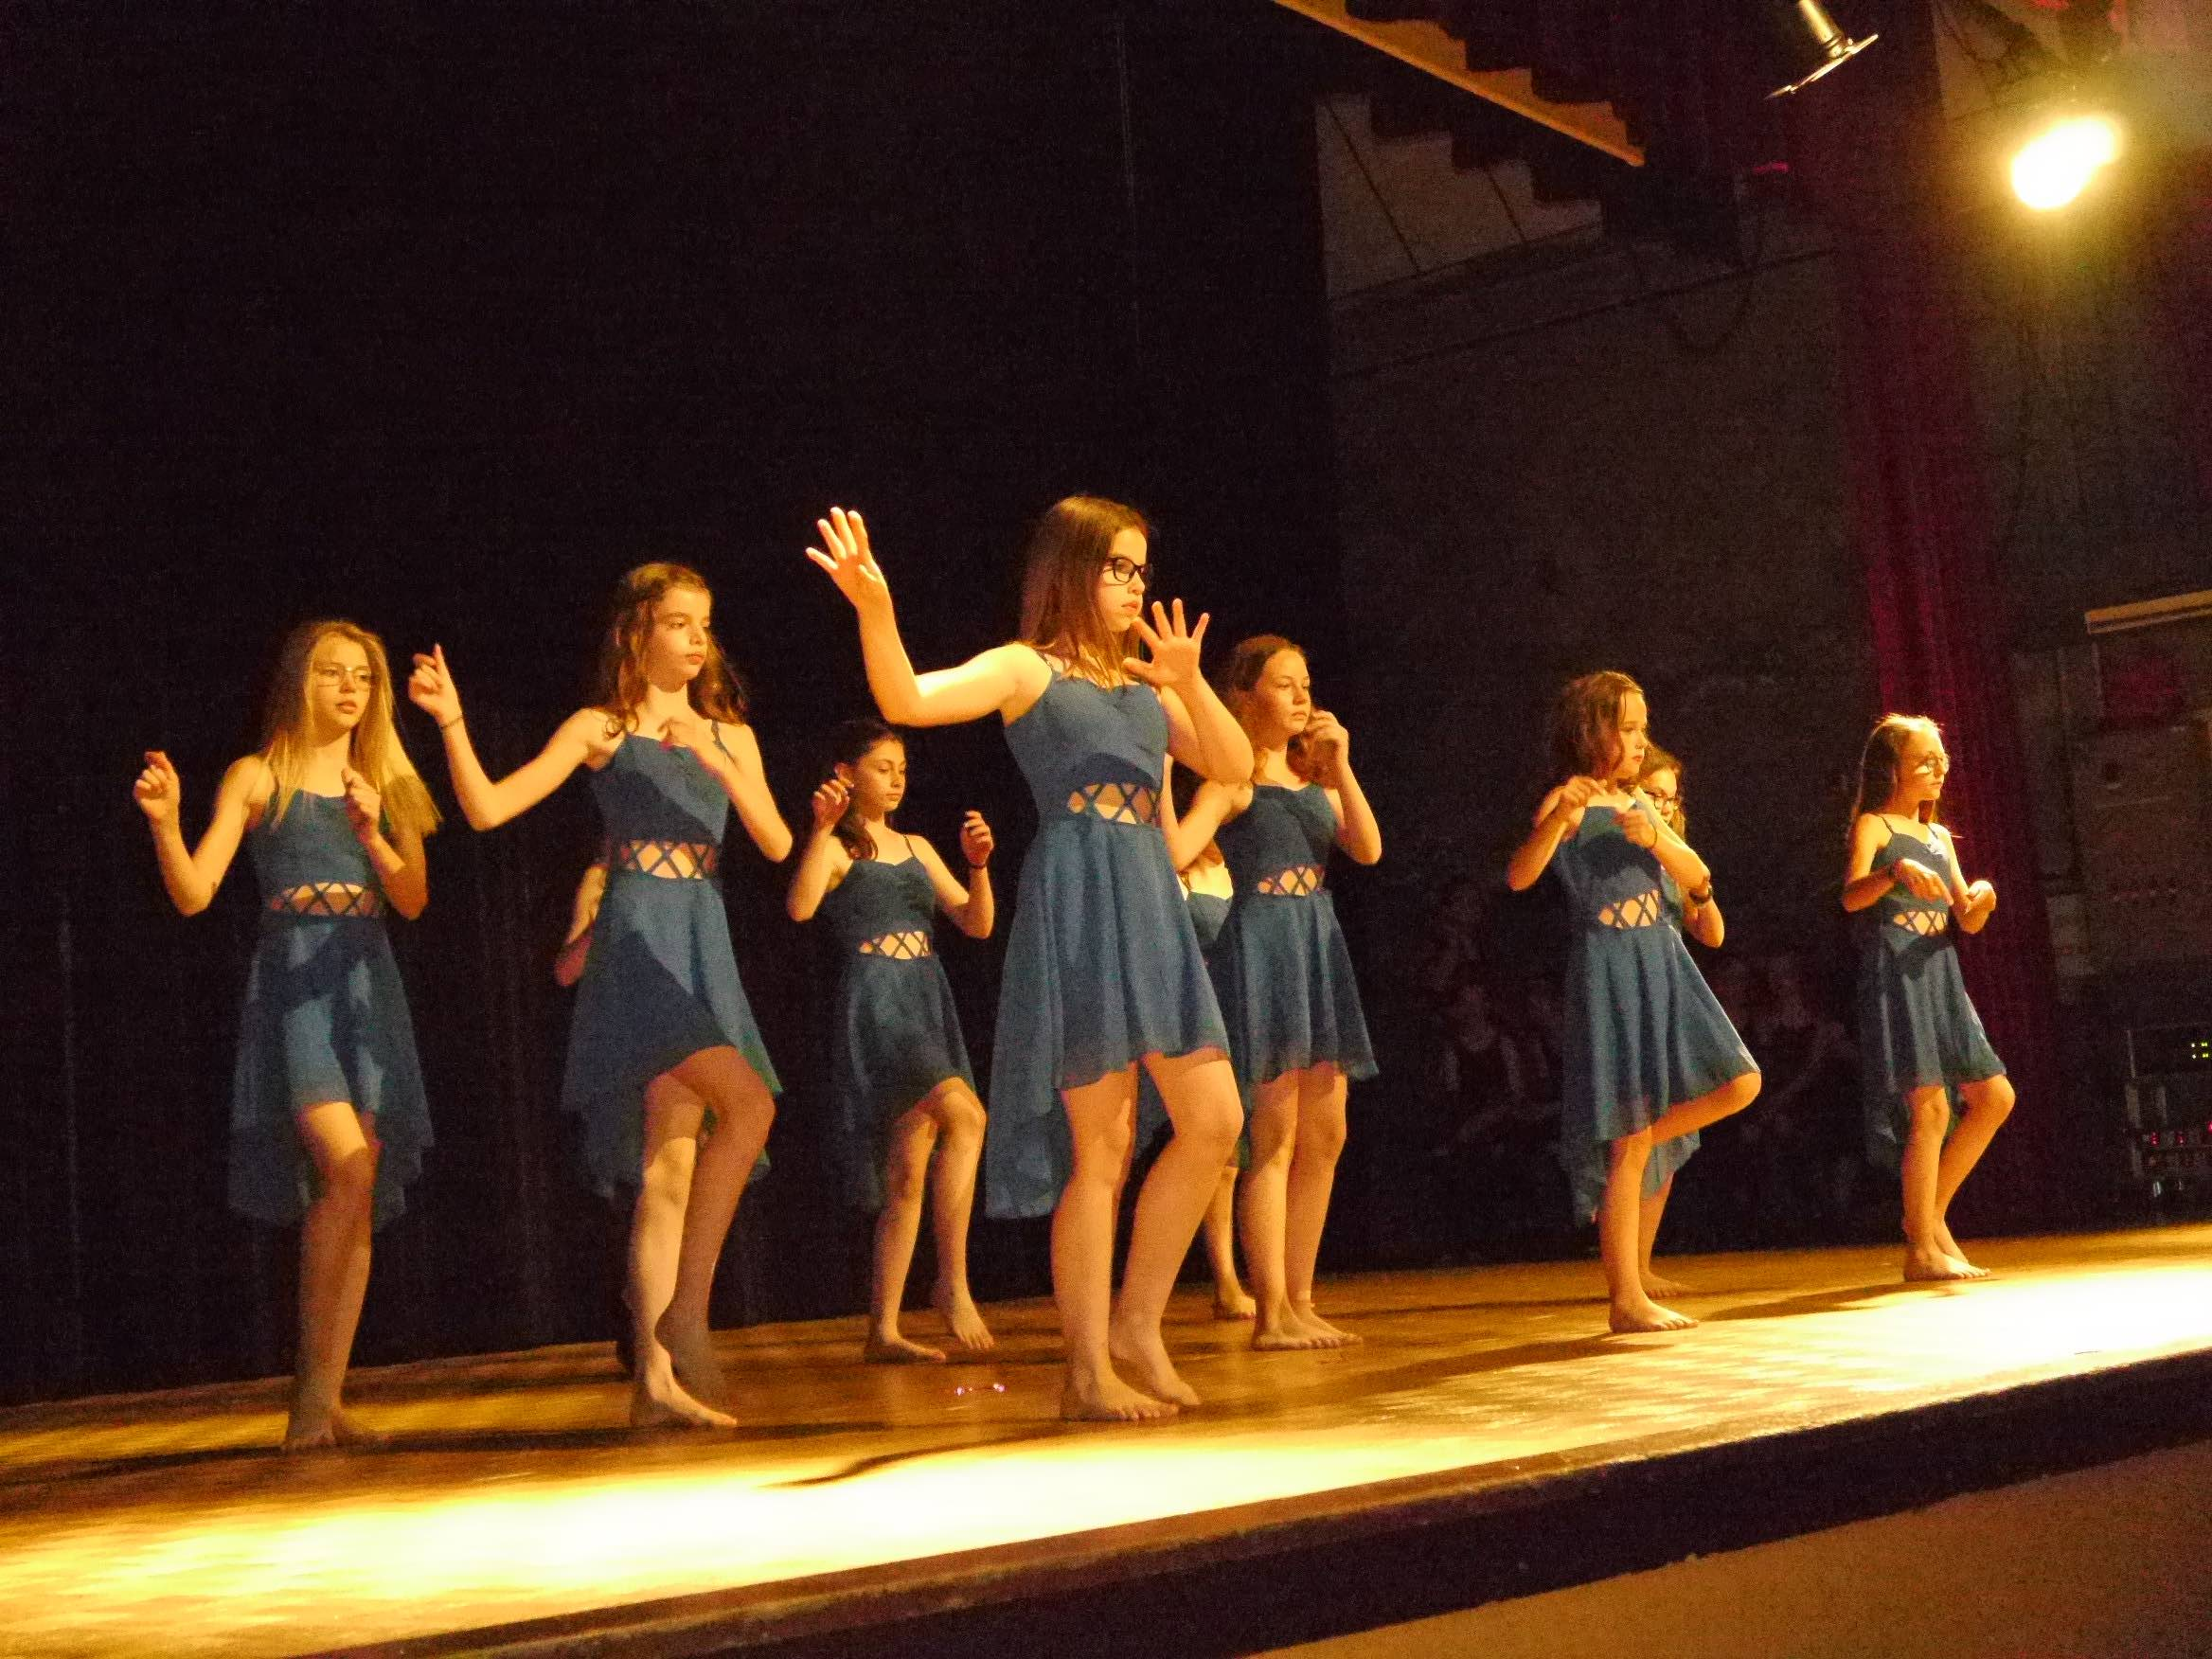 gala-danse-rythmique-fli-pompey 5 (16)